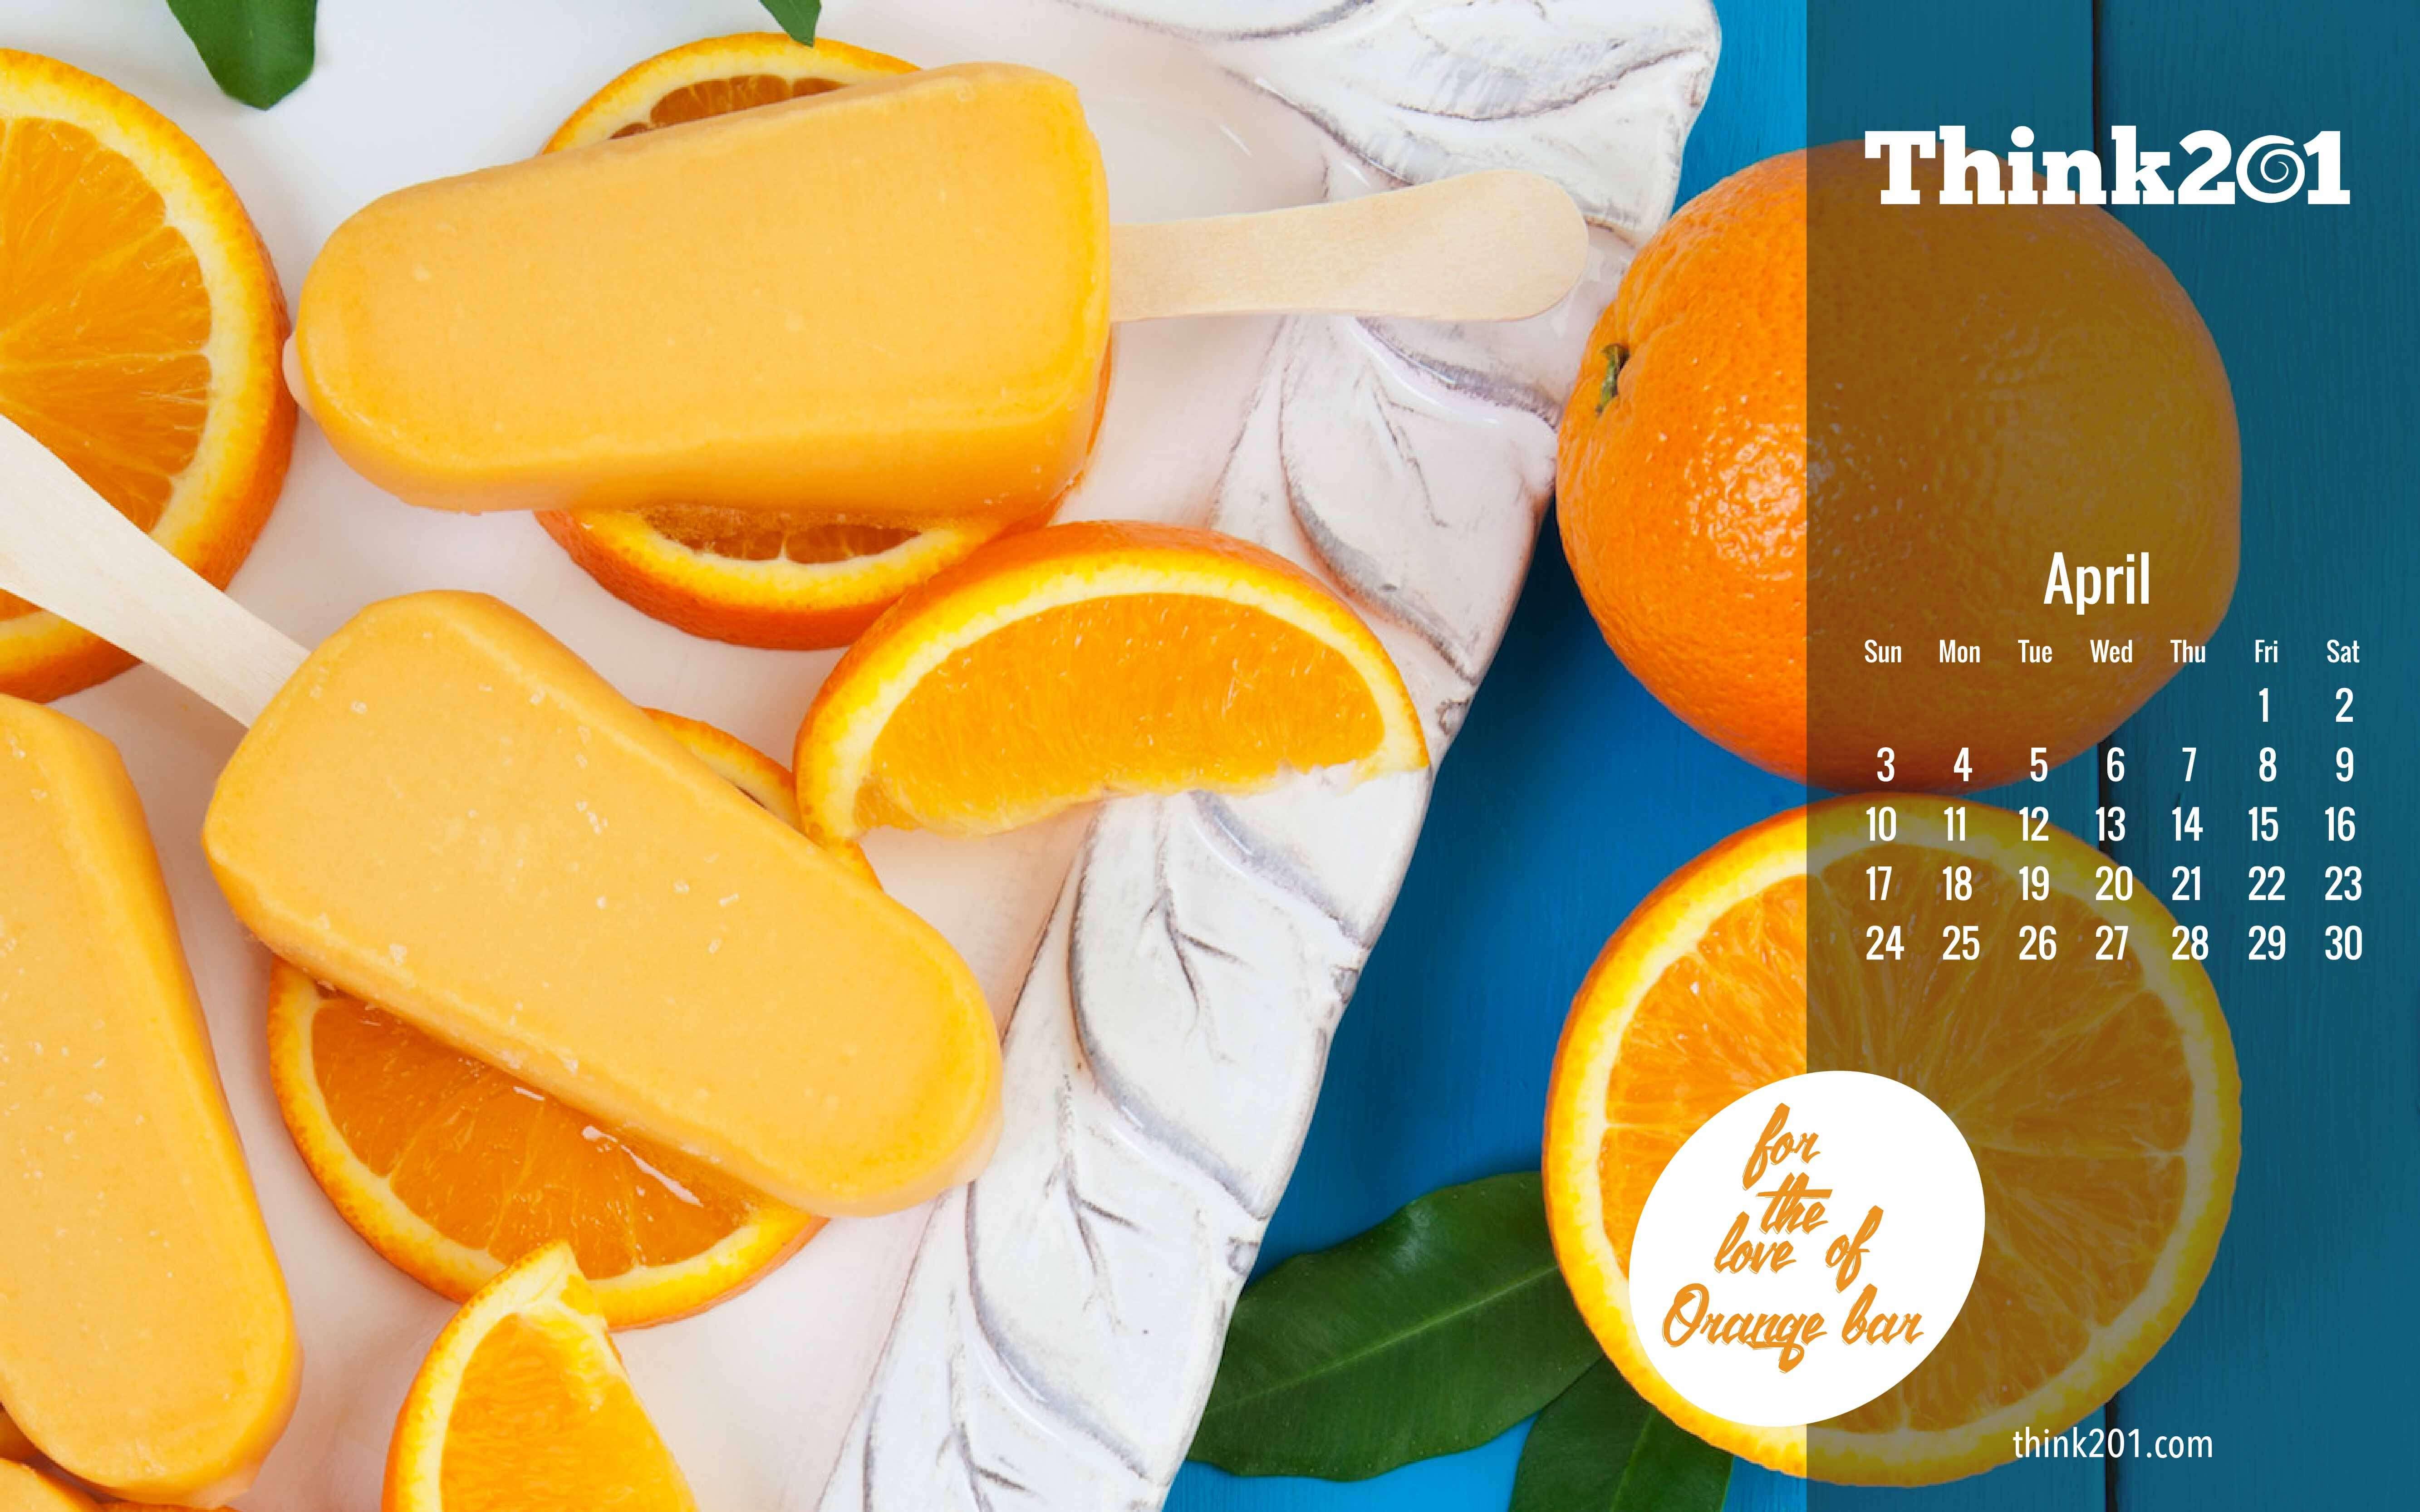 think201-april calendar06